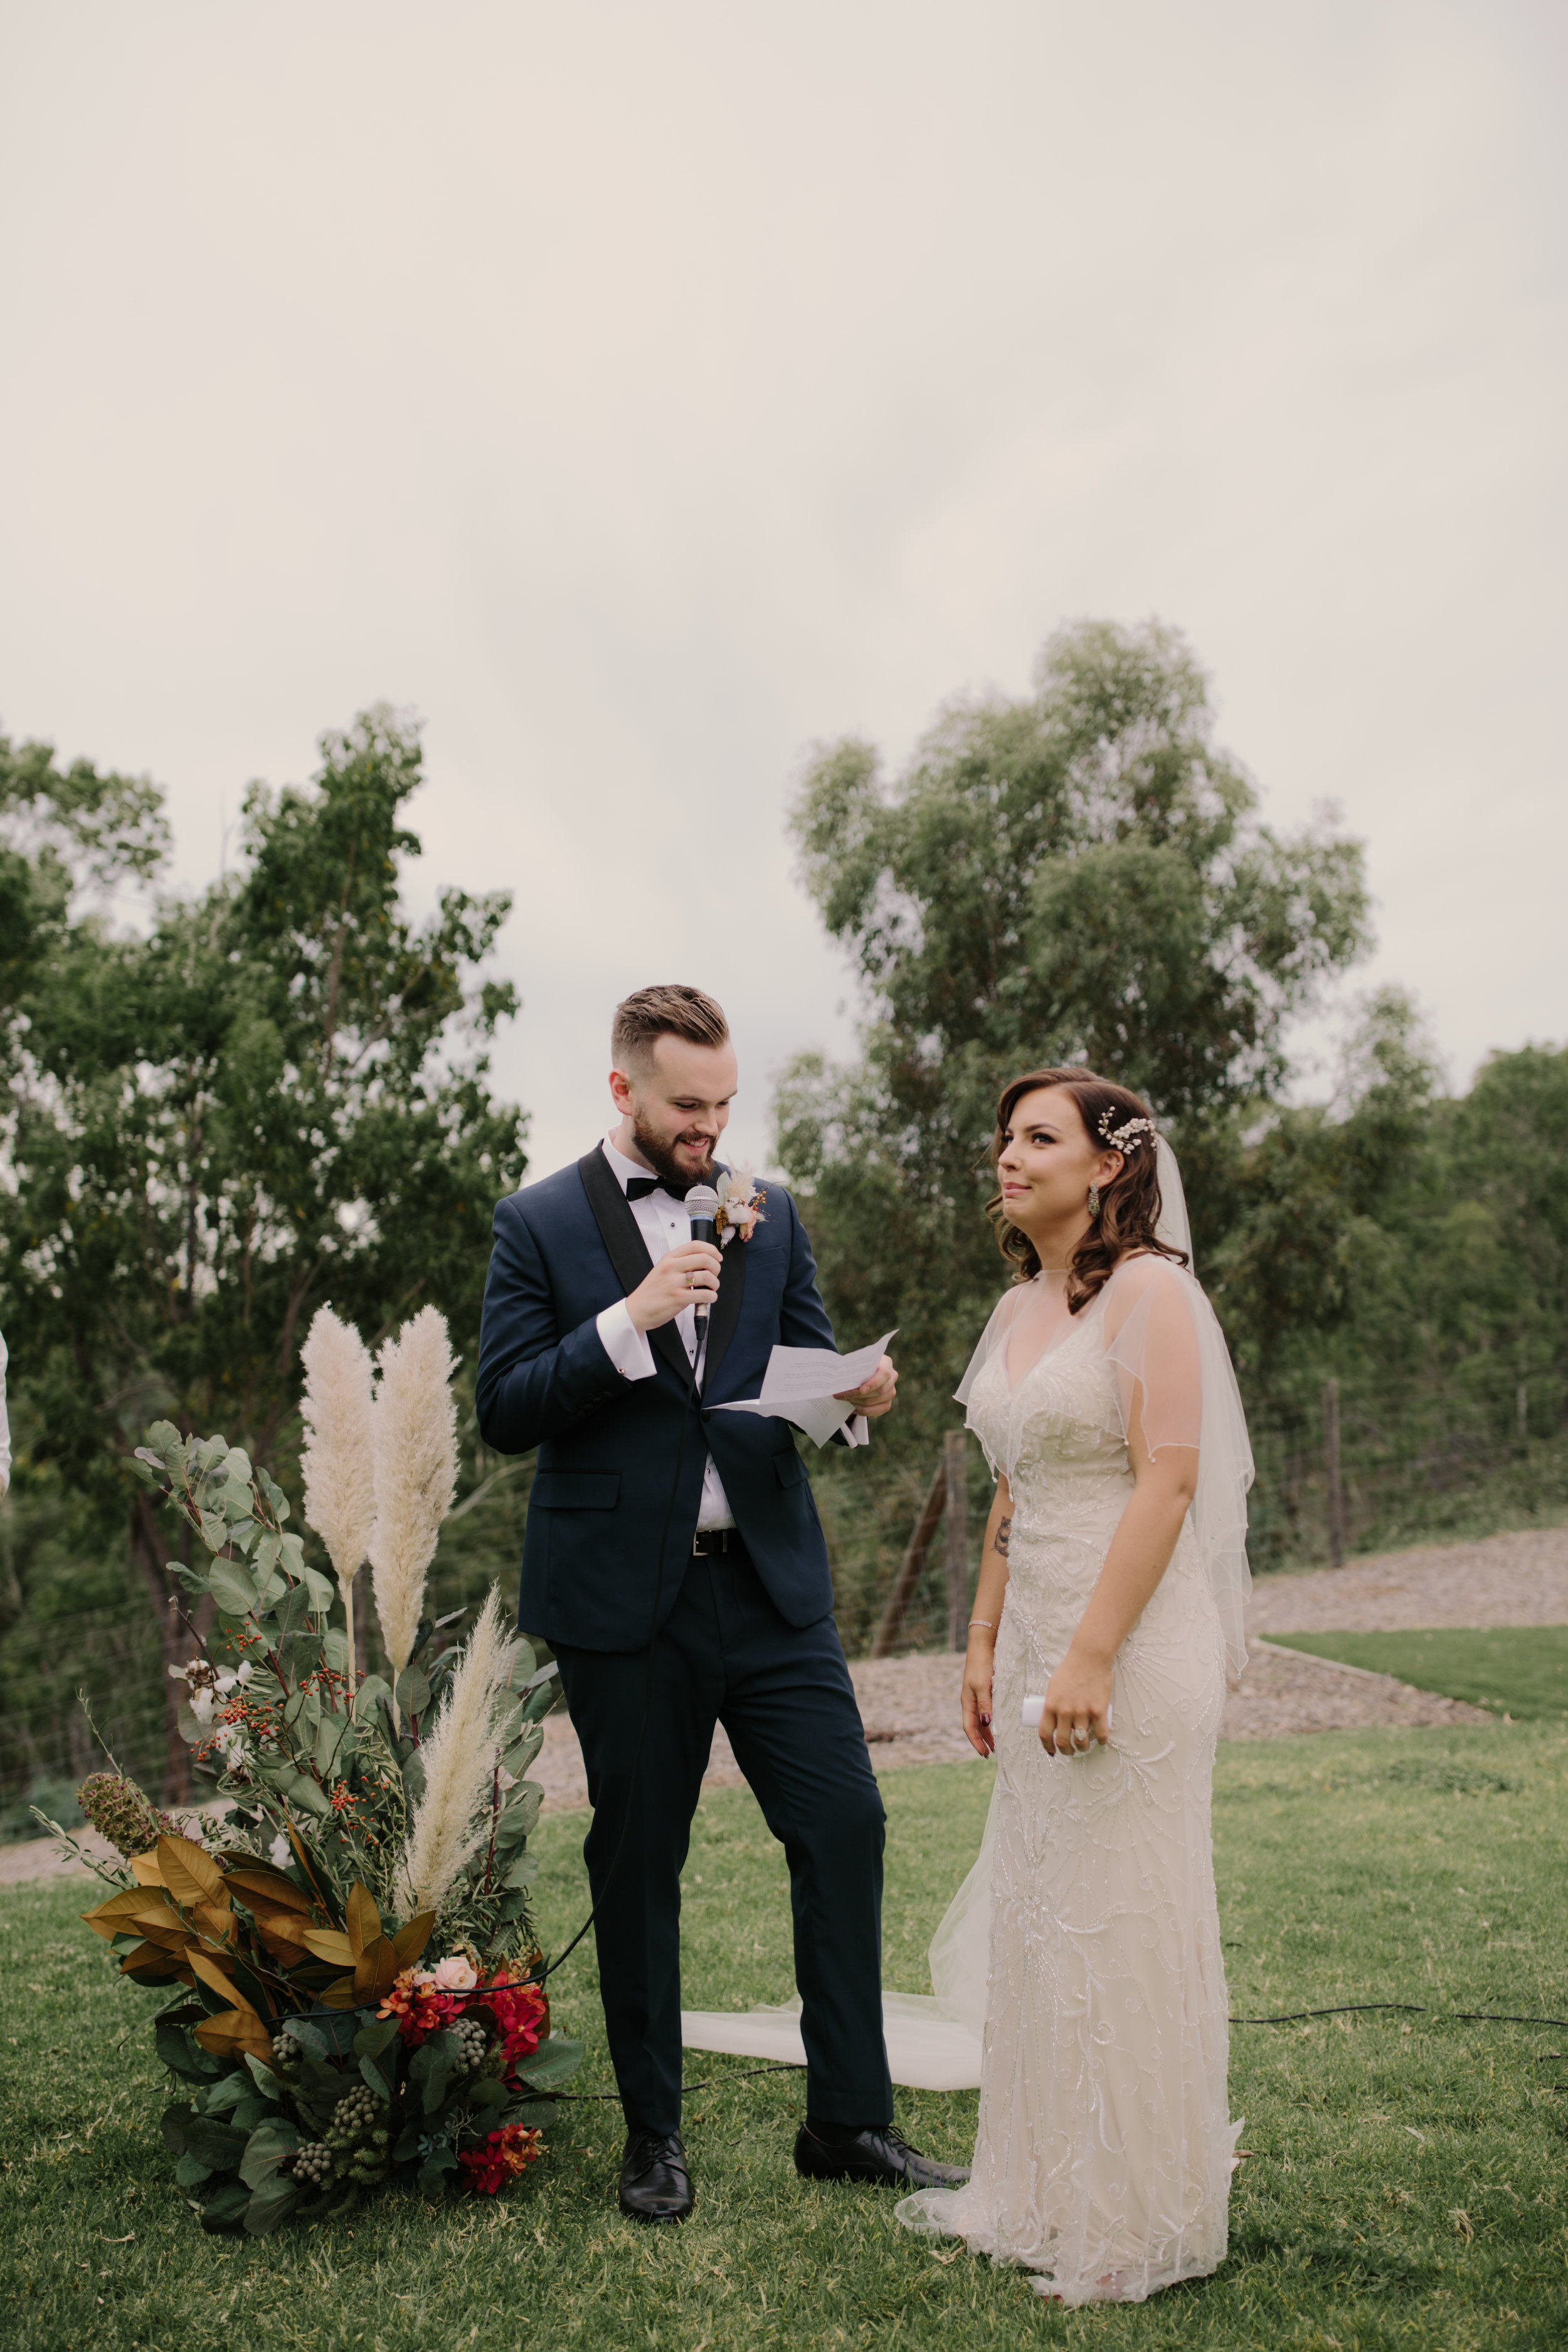 I-Got-You-Babe-Weddings-Melanie-Isaac0444.JPG